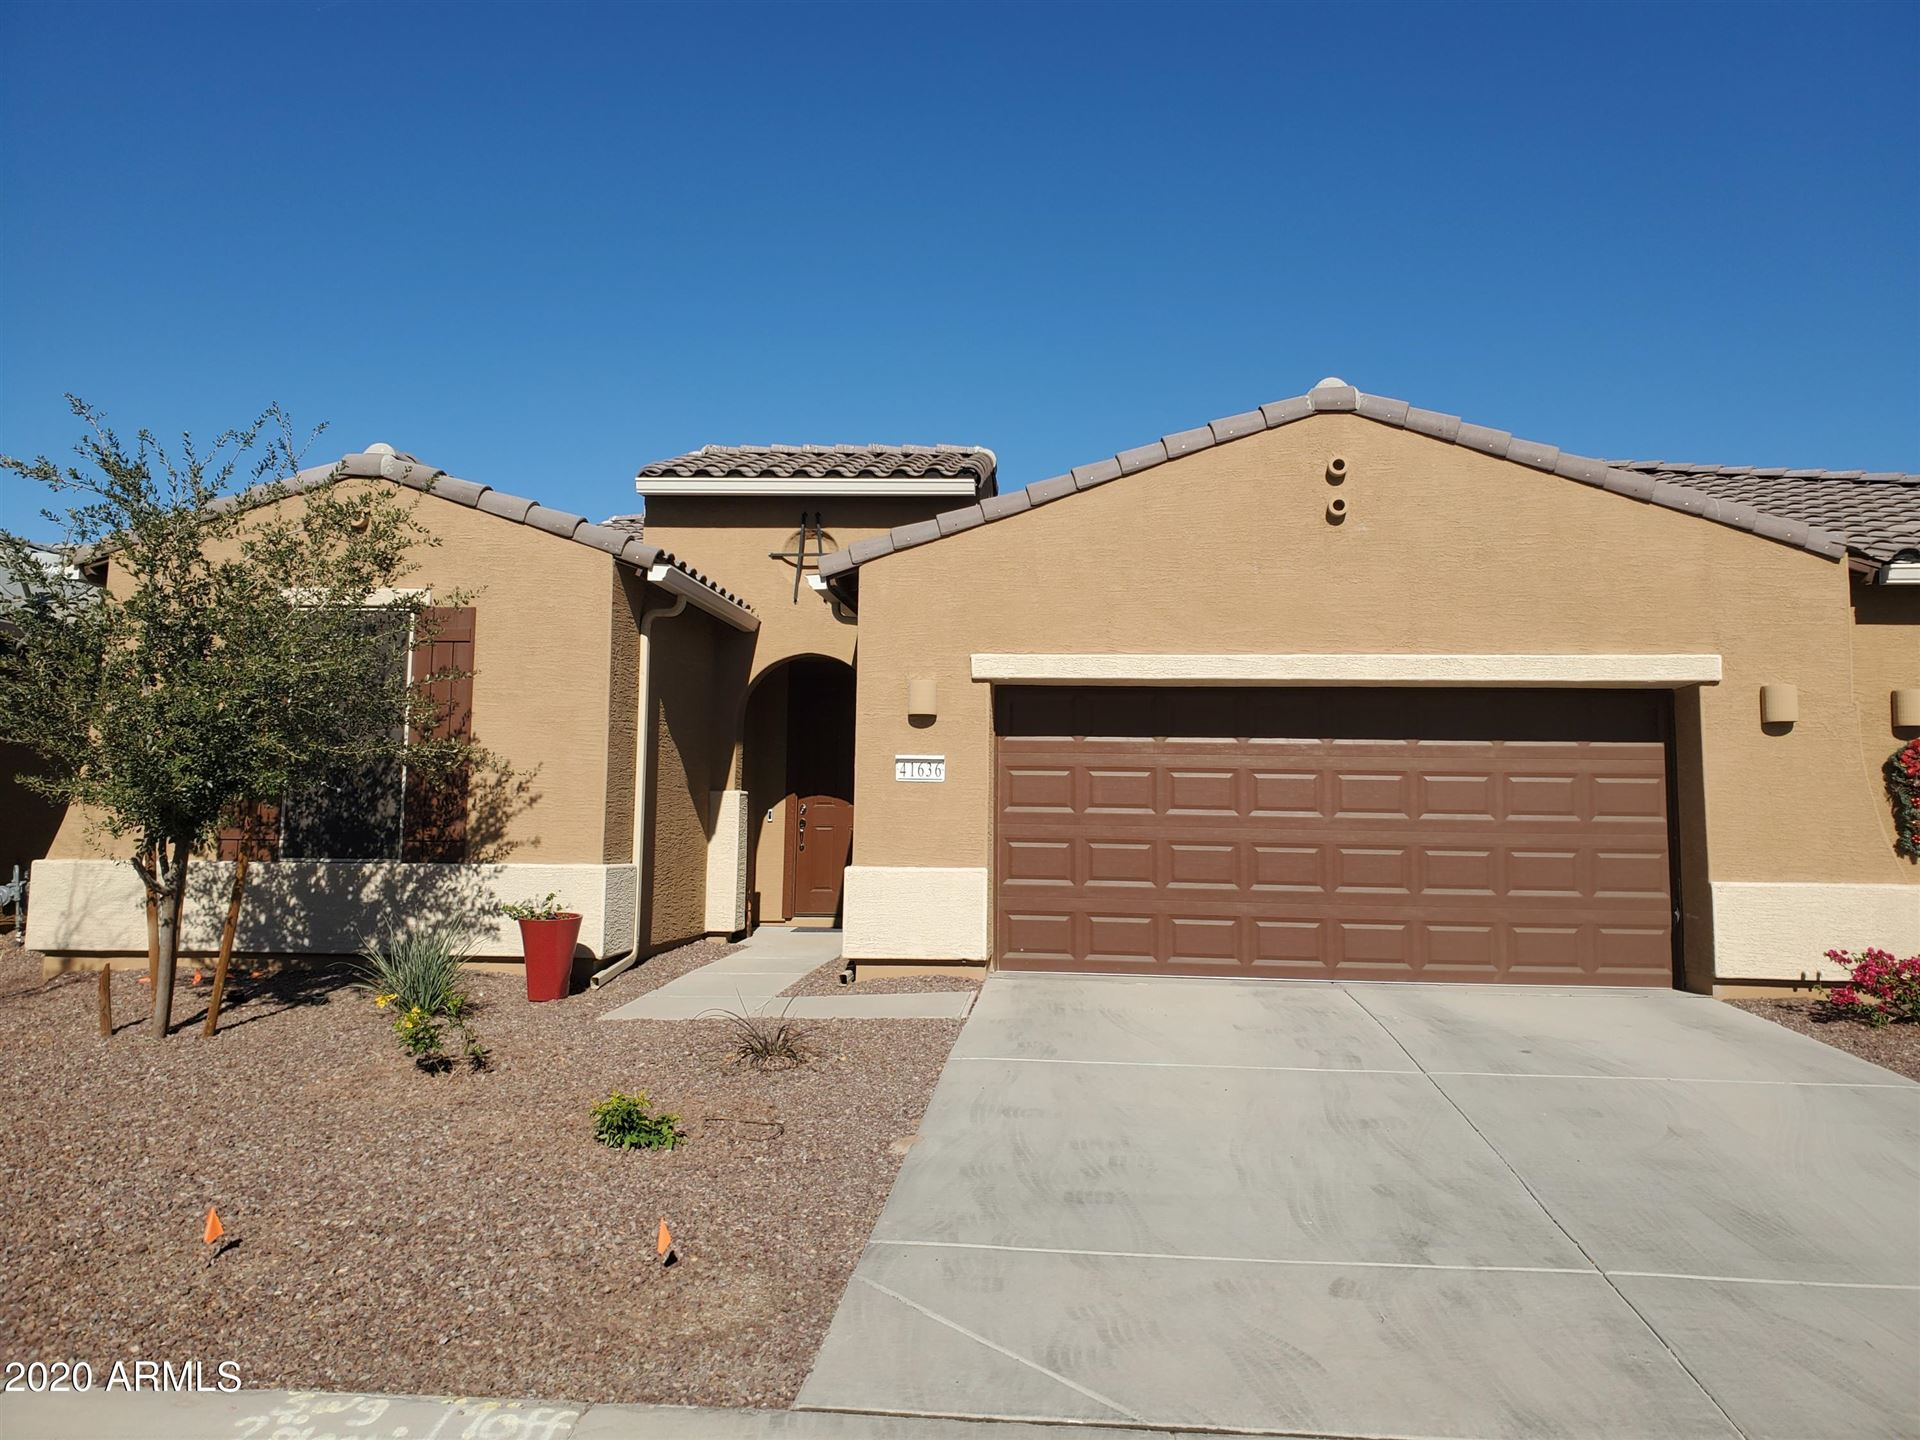 41636 W MONSOON Lane, Maricopa, AZ 85138 - MLS#: 6175063